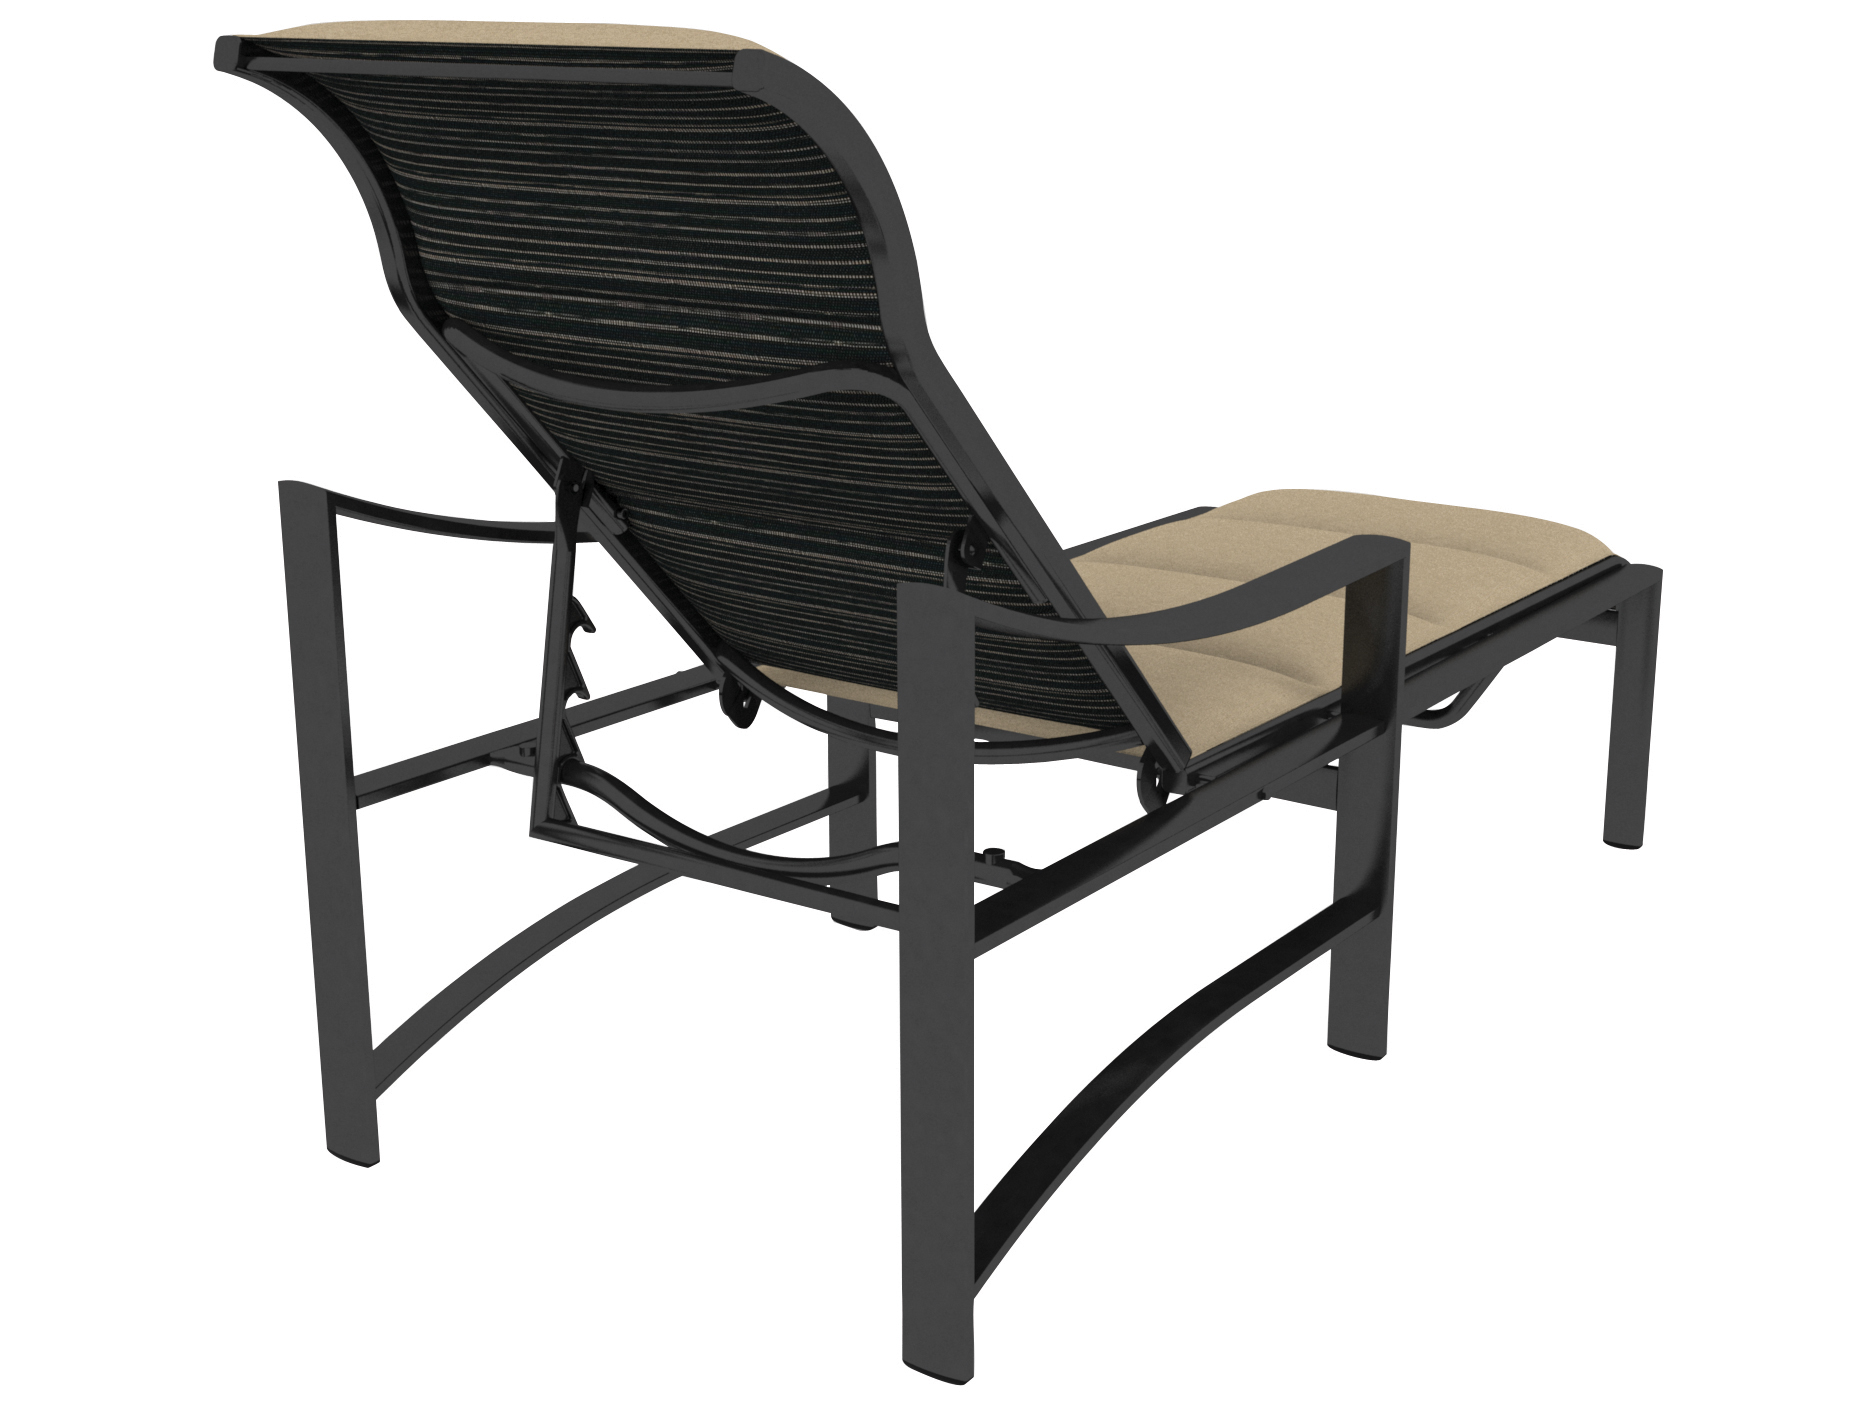 Tropitone kenzo padded sling aluminum chaise lounge for Aluminum strap chaise lounge